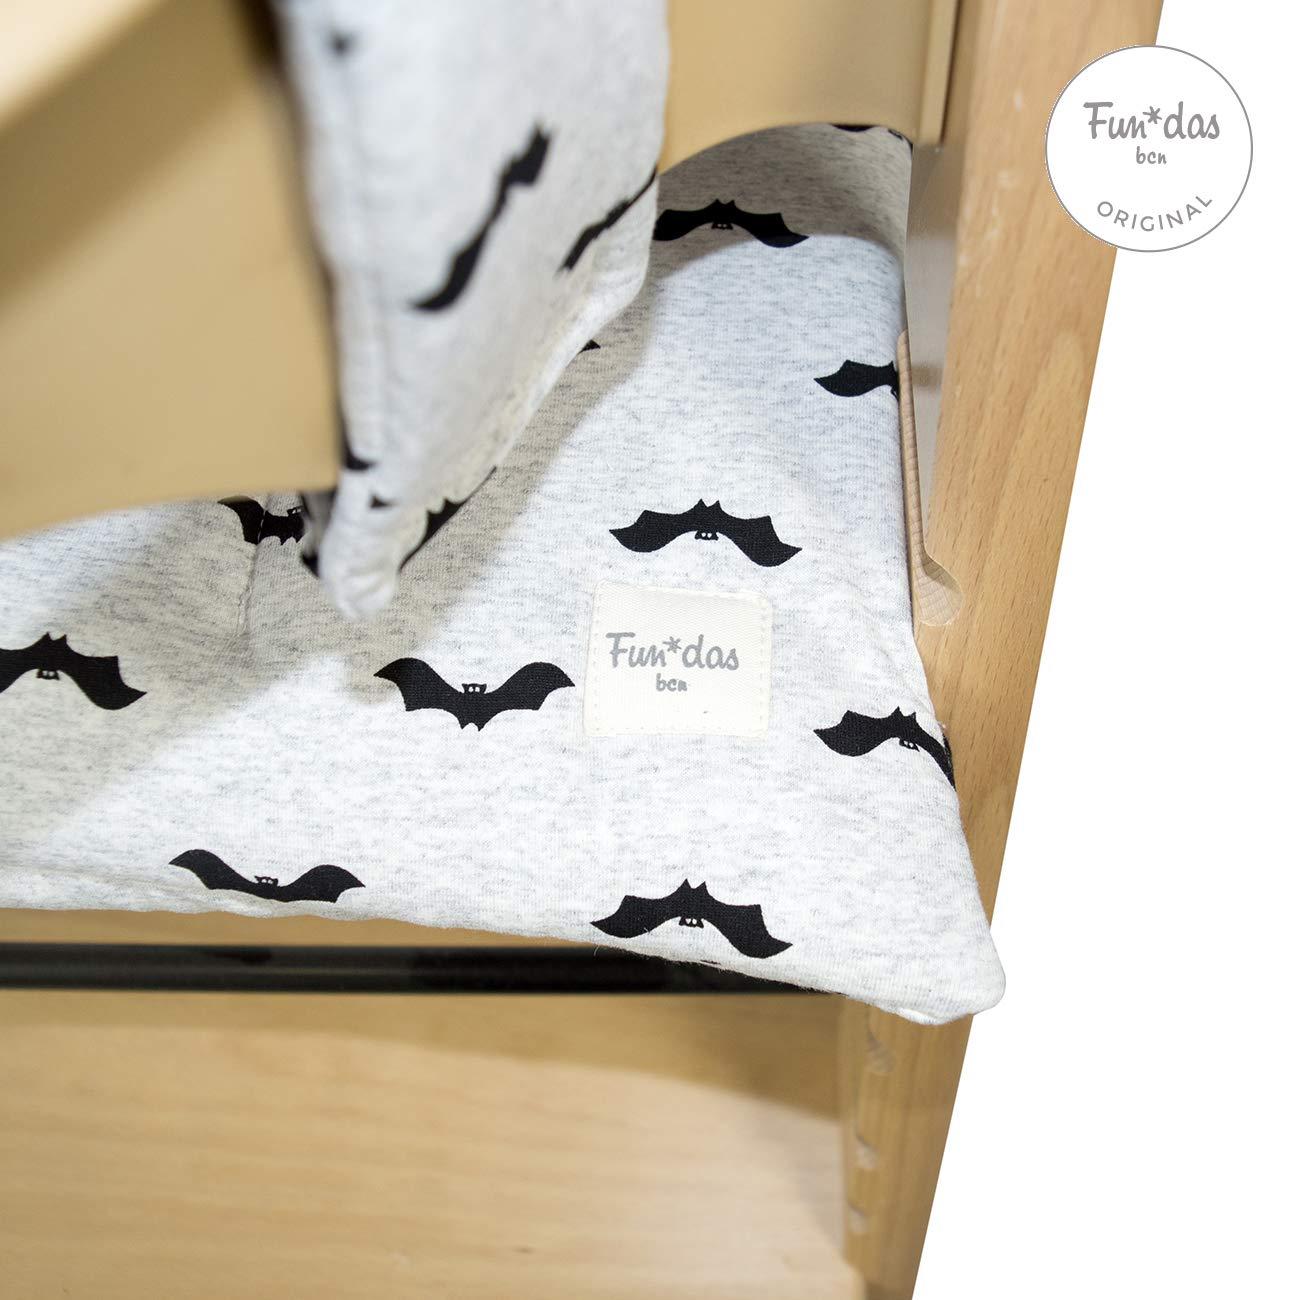 Fundas BCN /® F135//9099 Coj/ín para trona Stokke Tripp Trapp /® Baby Bat